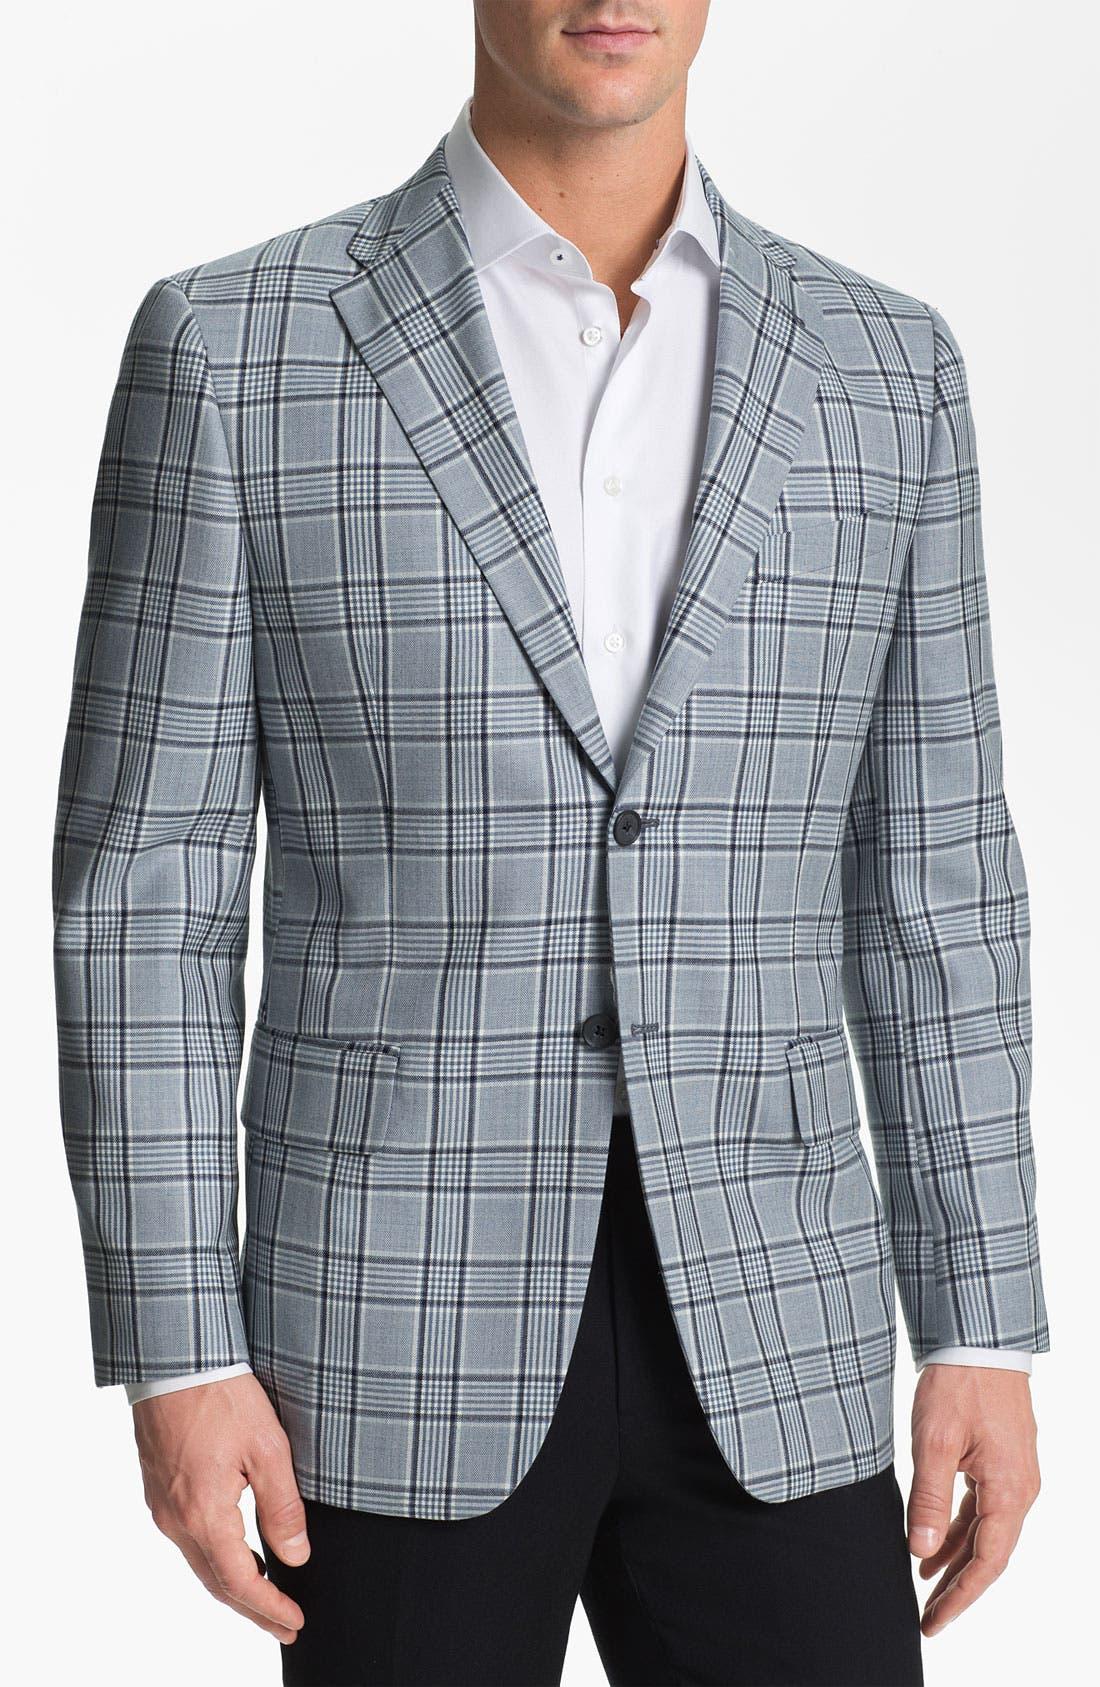 Alternate Image 1 Selected - Joseph Abboud Plaid Sportcoat